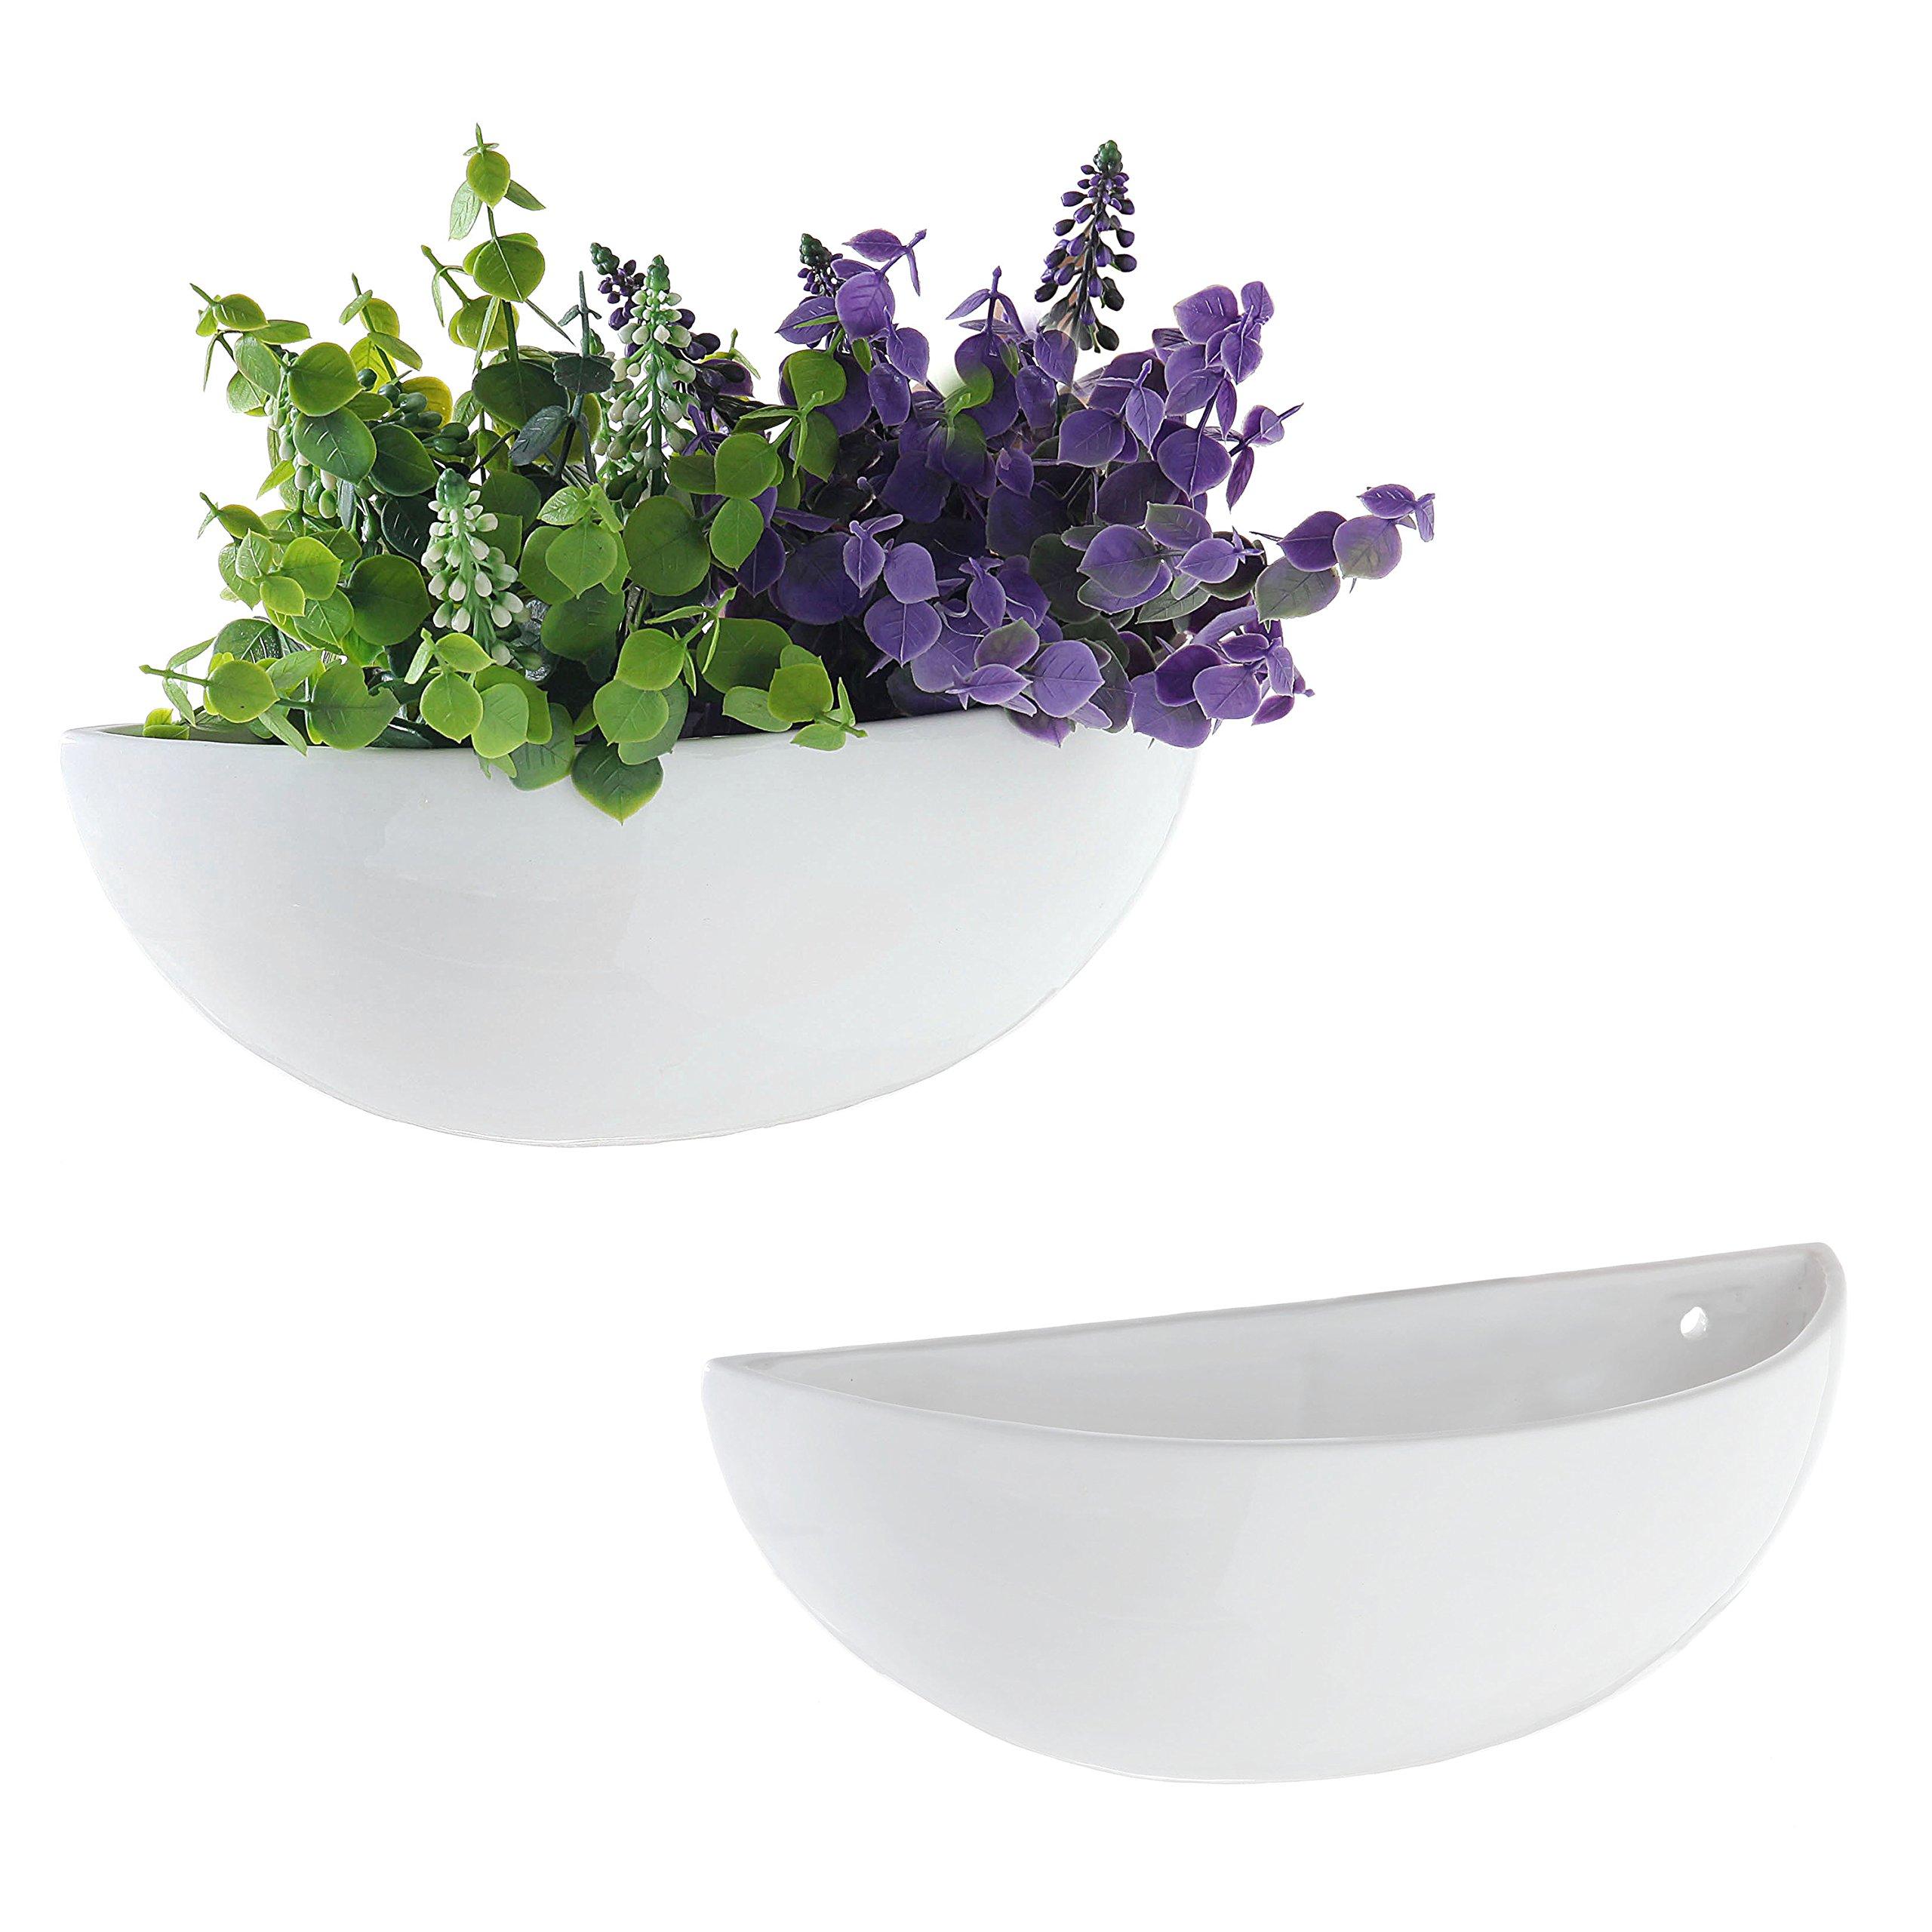 MyGift 12-Inch Ceramic Half-Moon Wall Mounted Flower Planter Vase, Set of 2